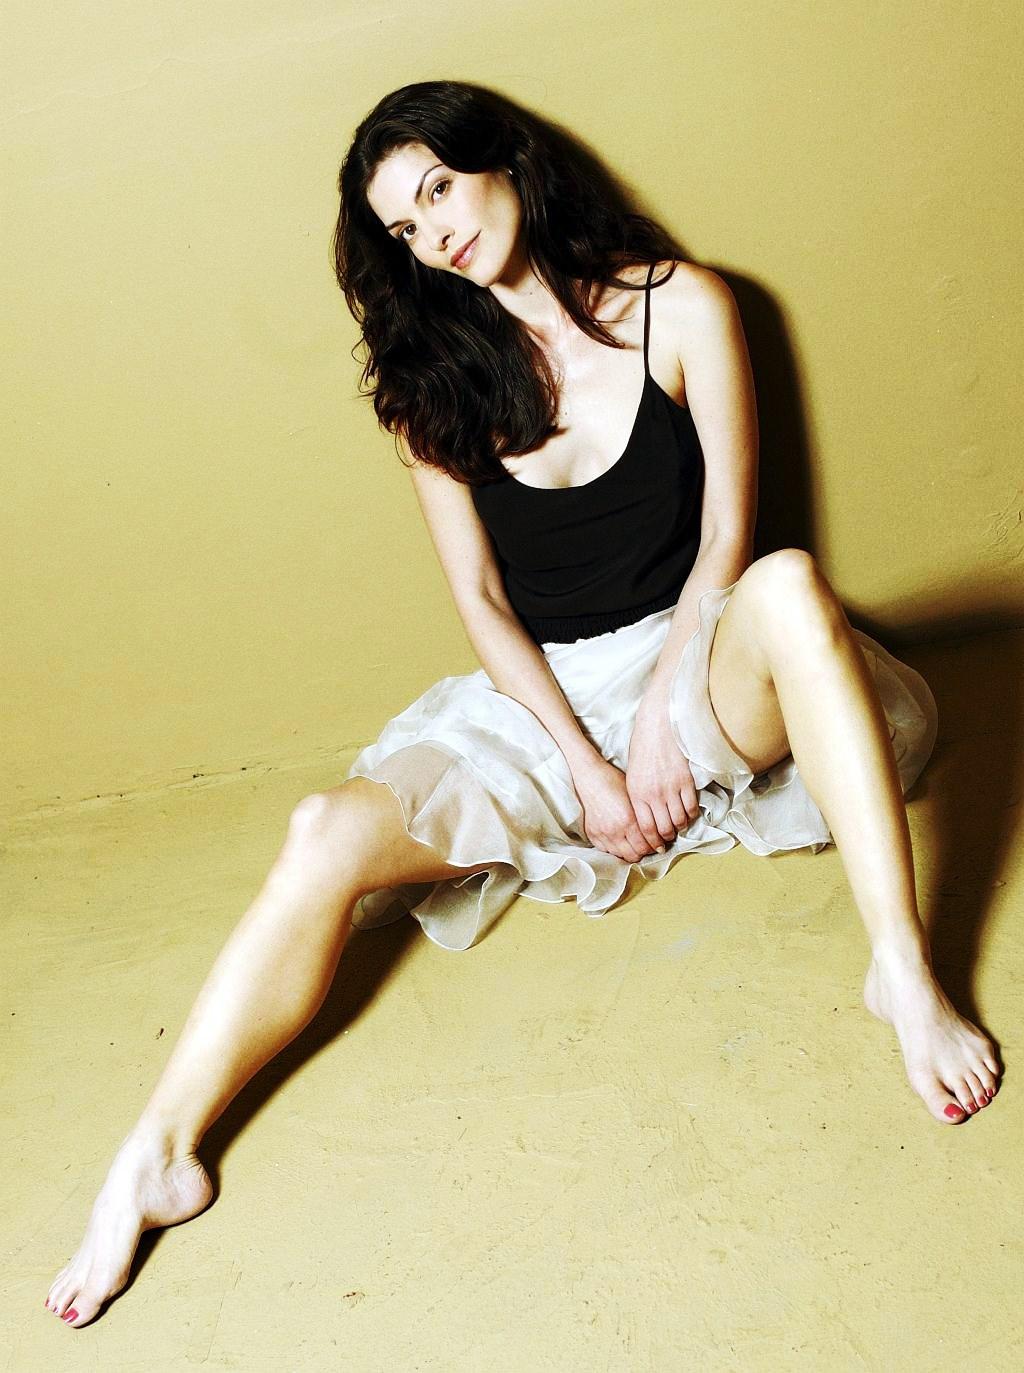 Alana de la garza nude are you here 2013 - 1 7